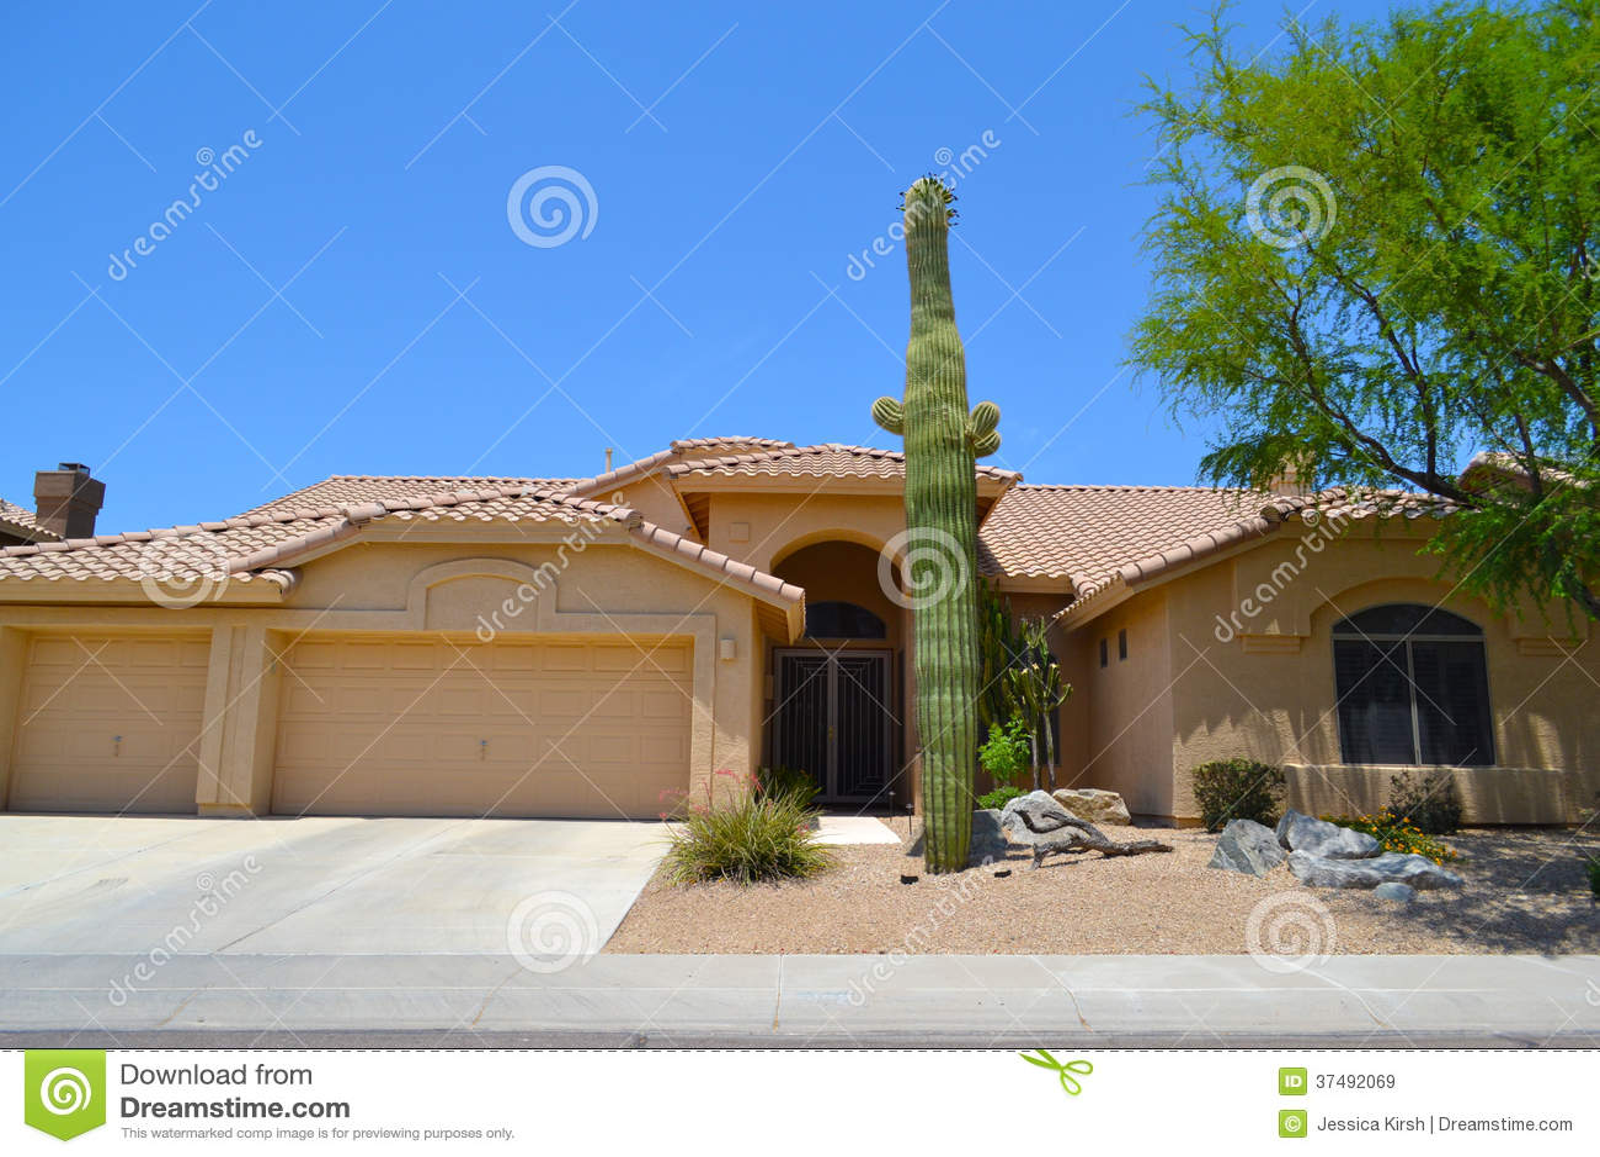 Beautiful One Story Mediterranean Style Southwestern Home